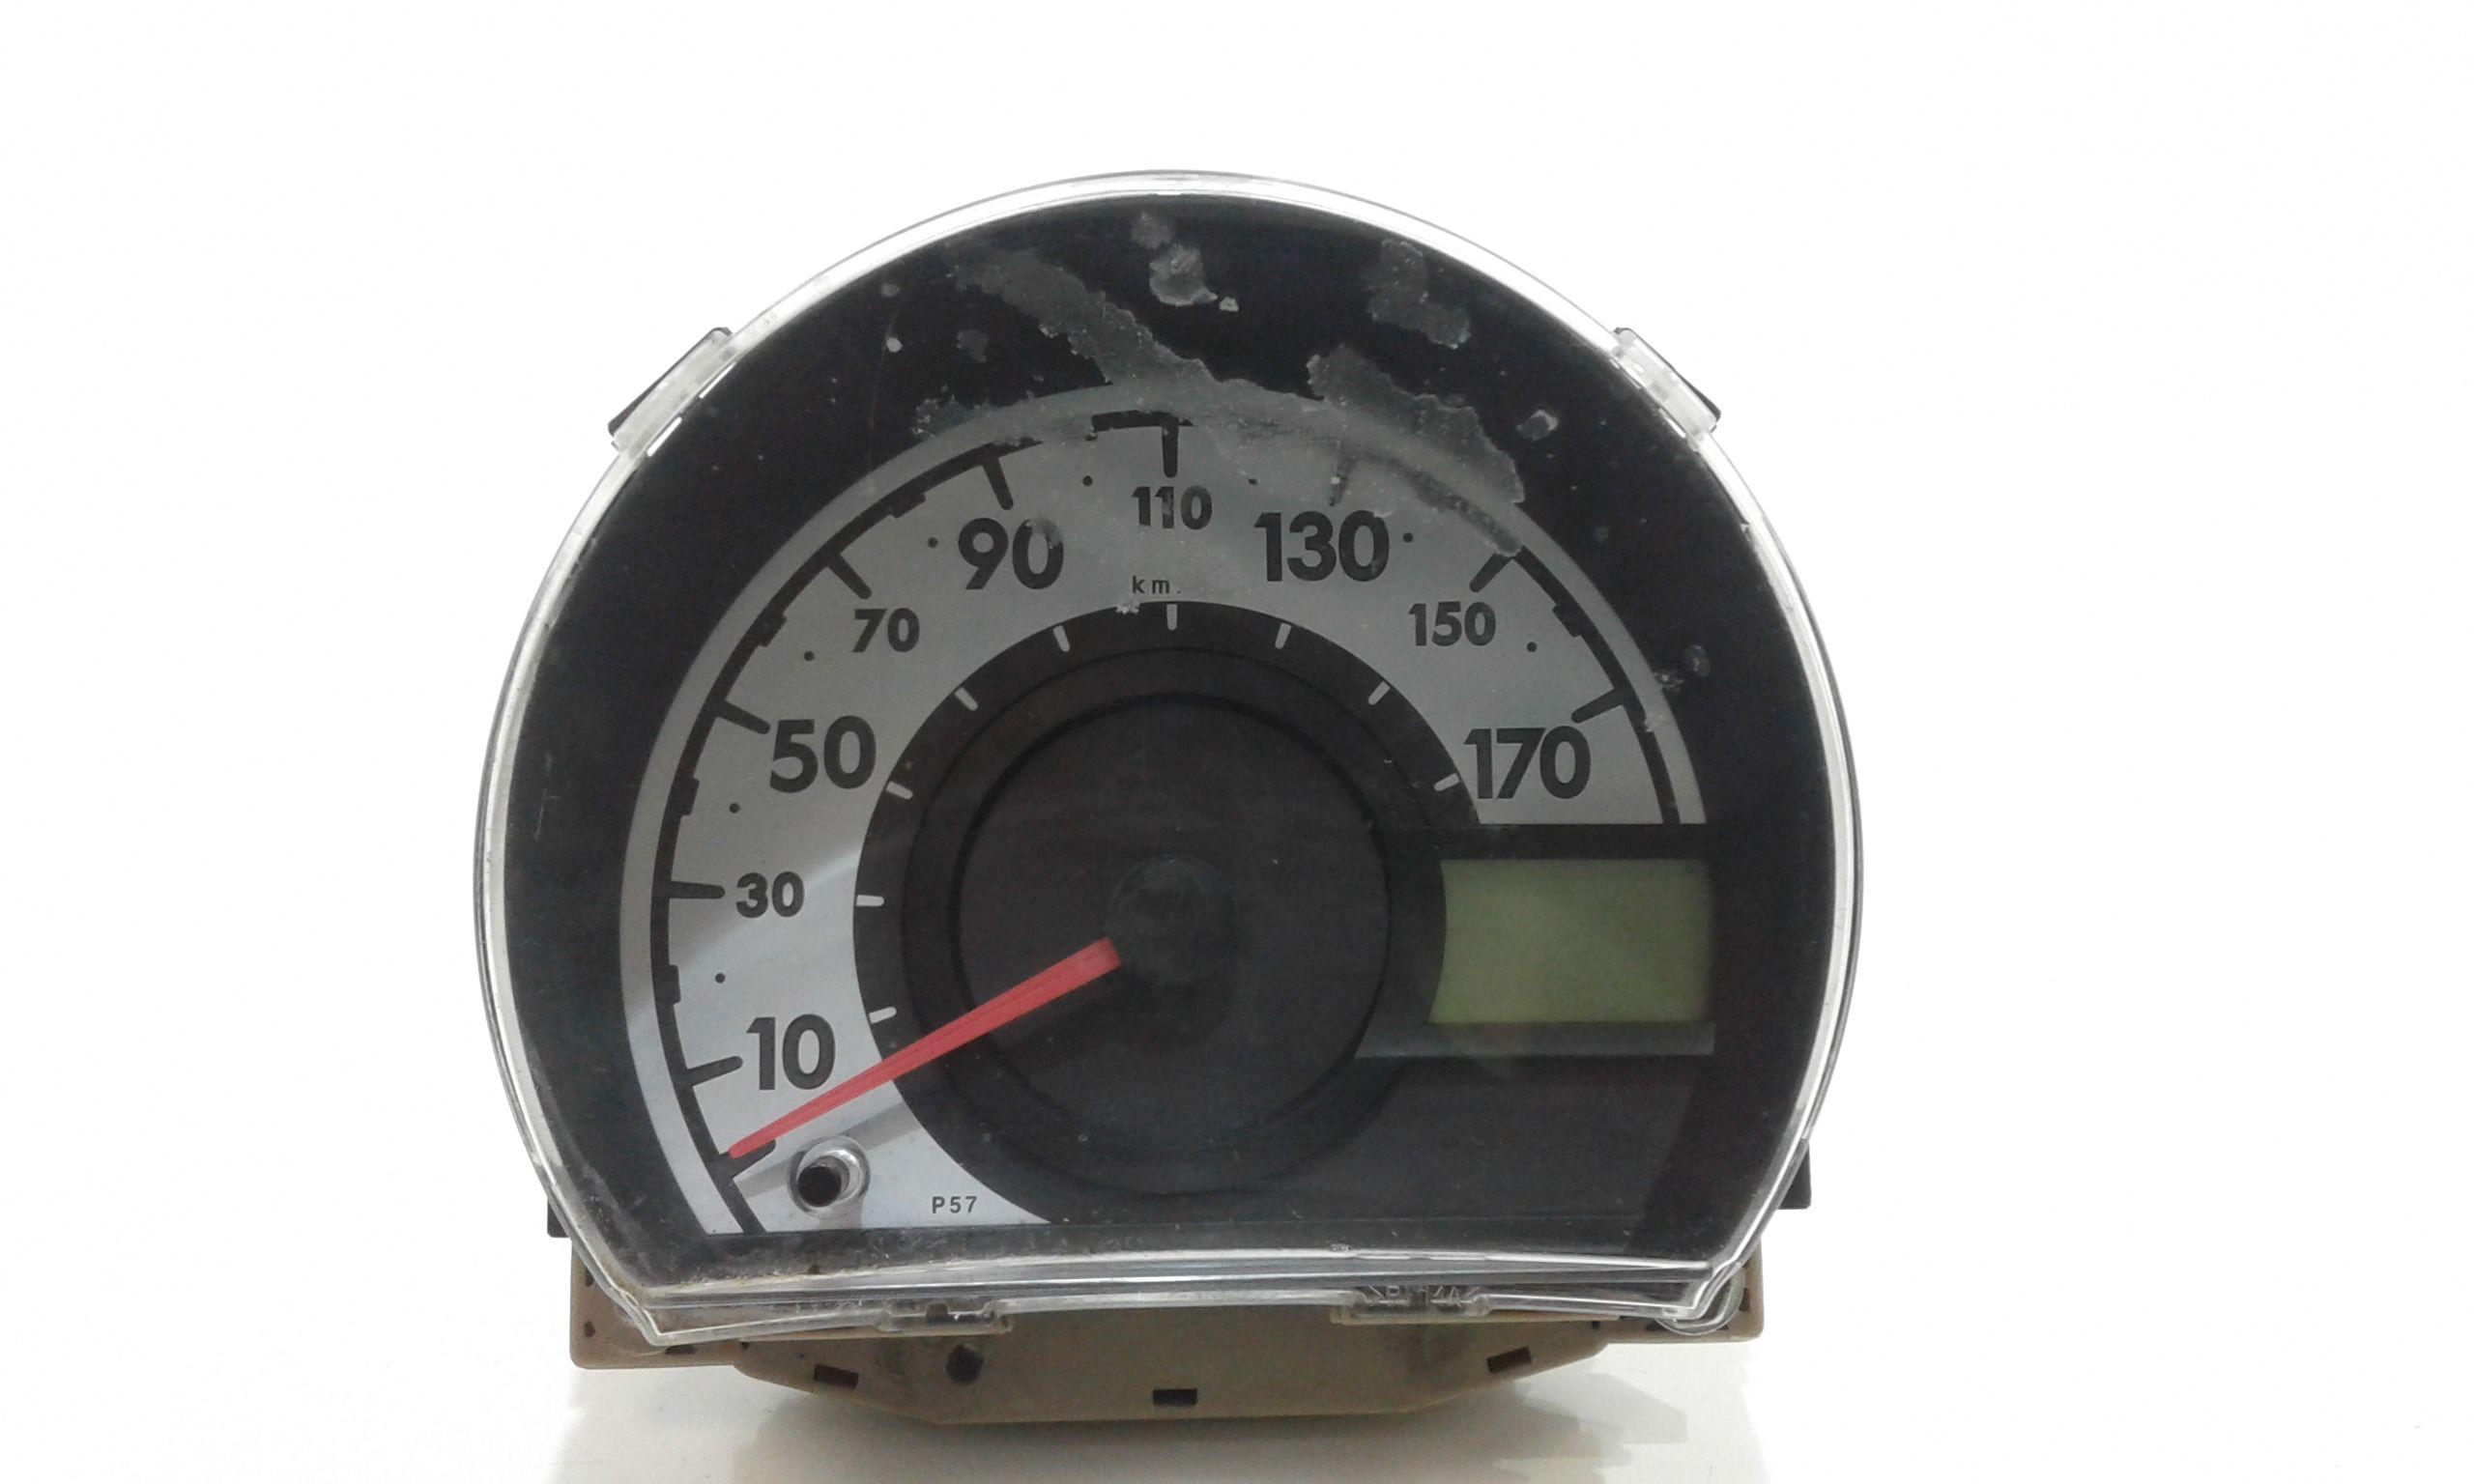 83800-0h021 QUADRO STRUMENTI PEUGEOT 107 1° Serie 1000 Benzina  (2006) RICAMBI USATI